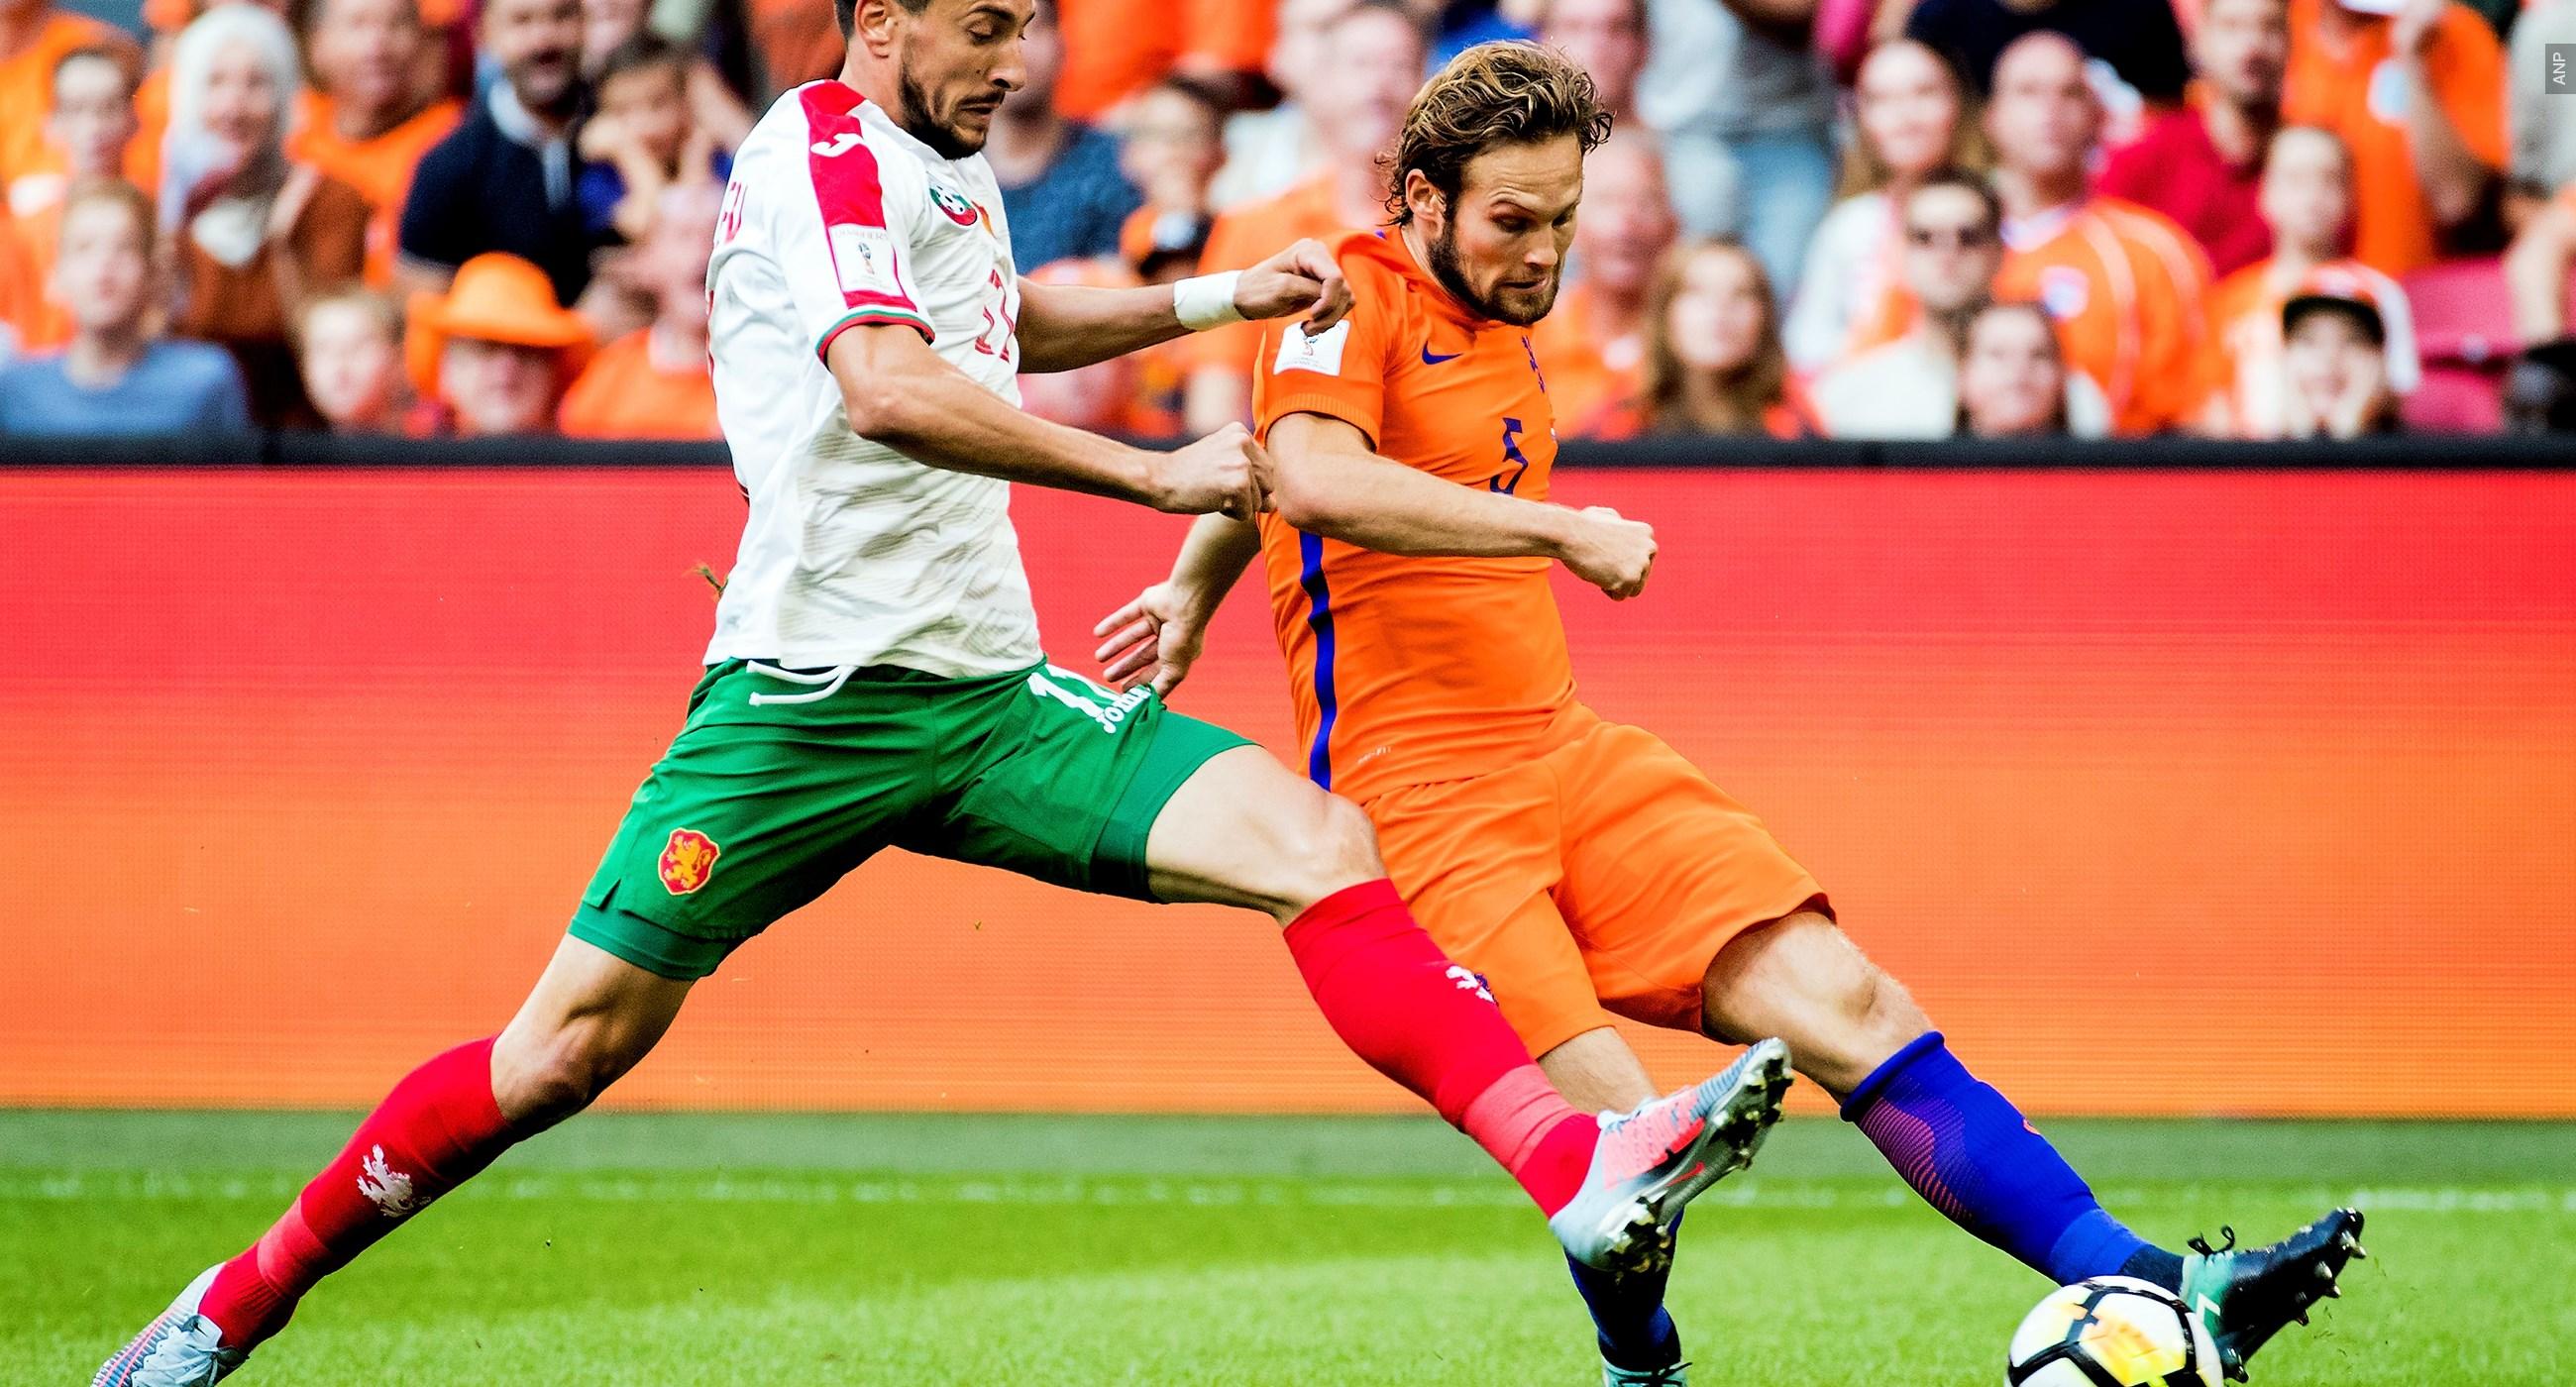 Oefeninterland: Portugal-Nederland